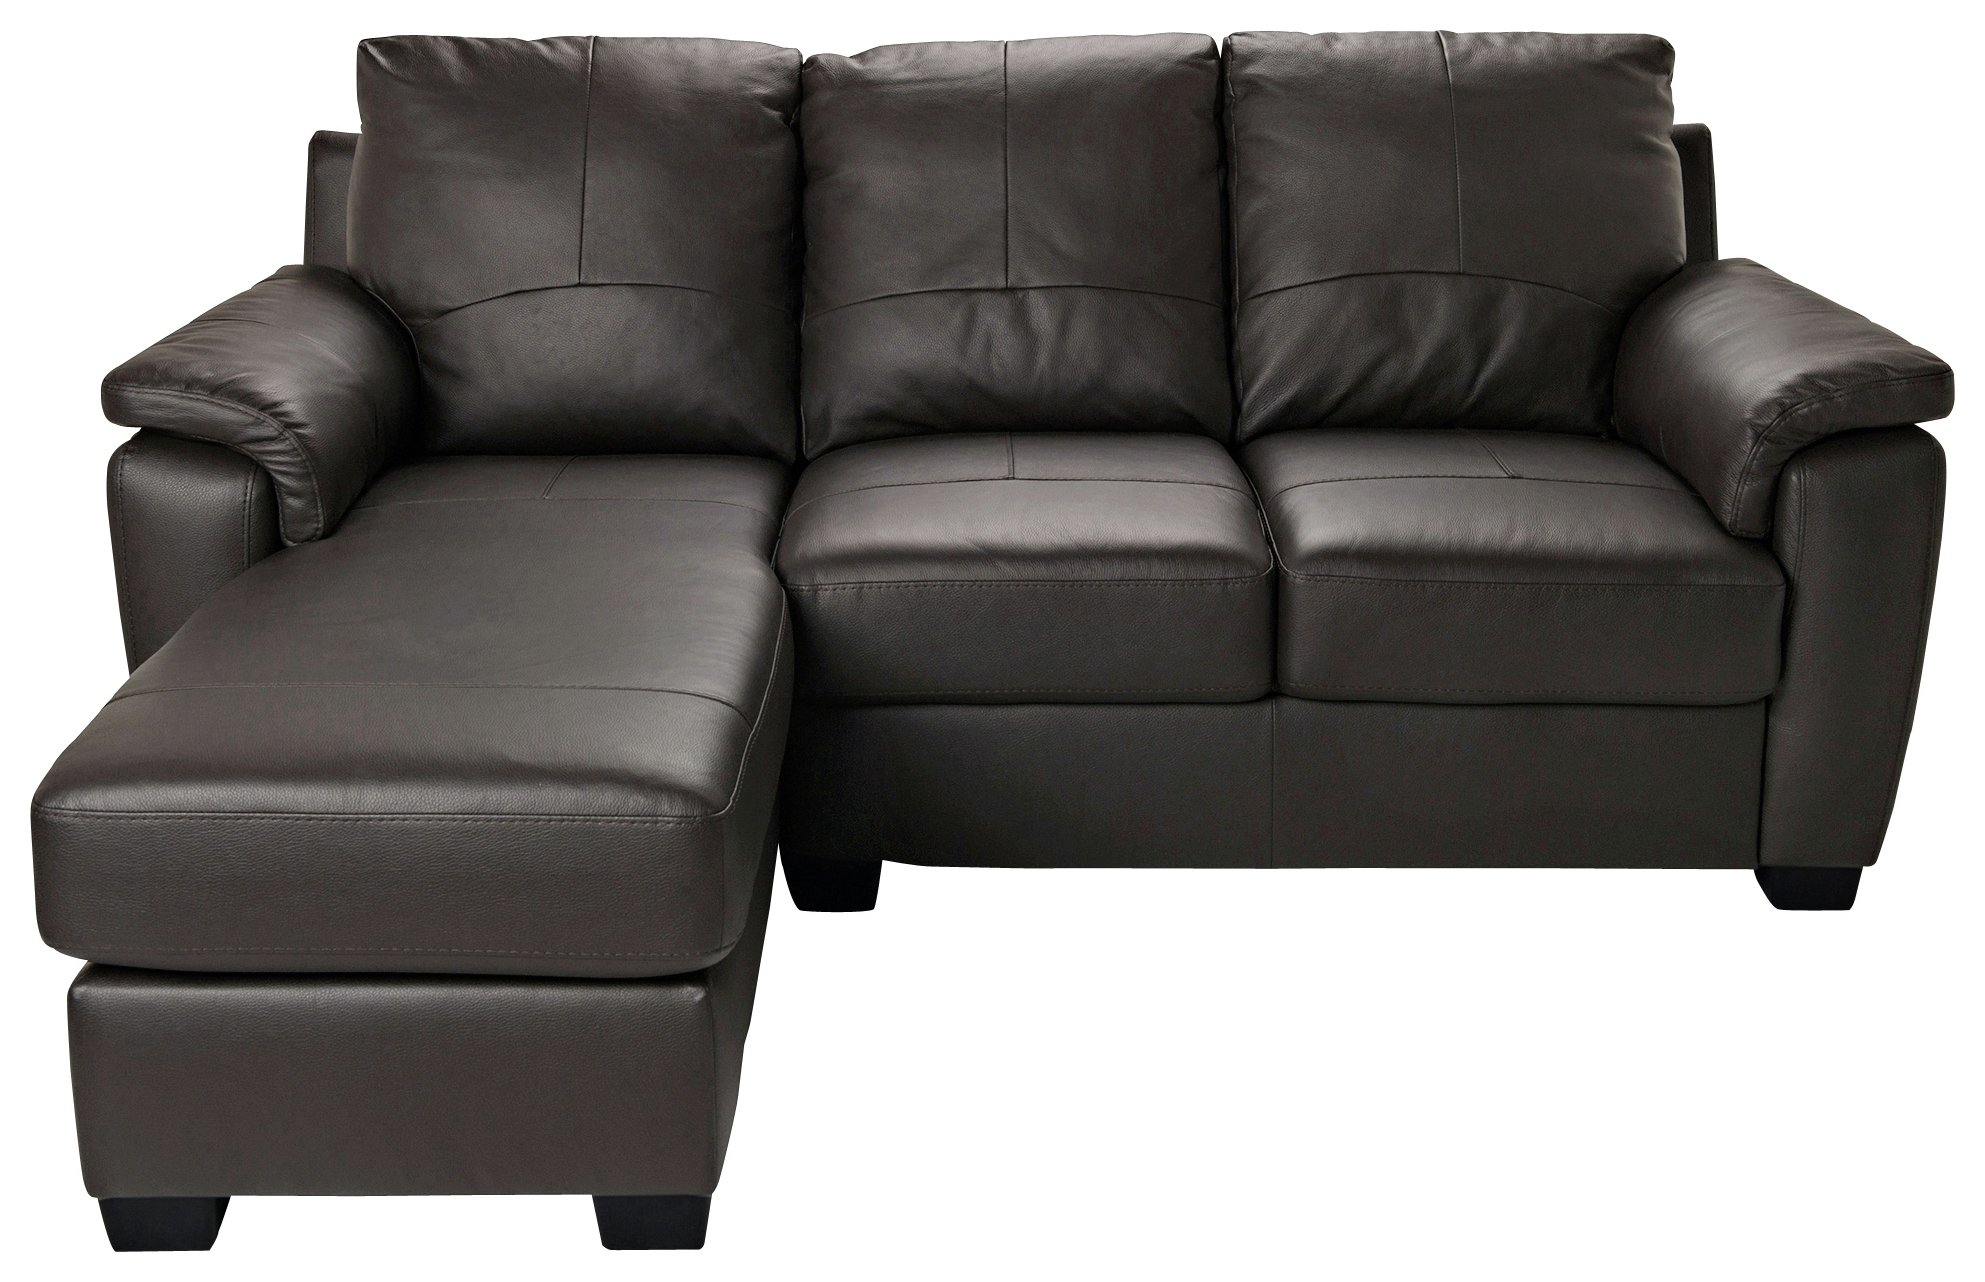 HOME - Antonio - Leather/Leather Eff Left Corner Sofa - Choc